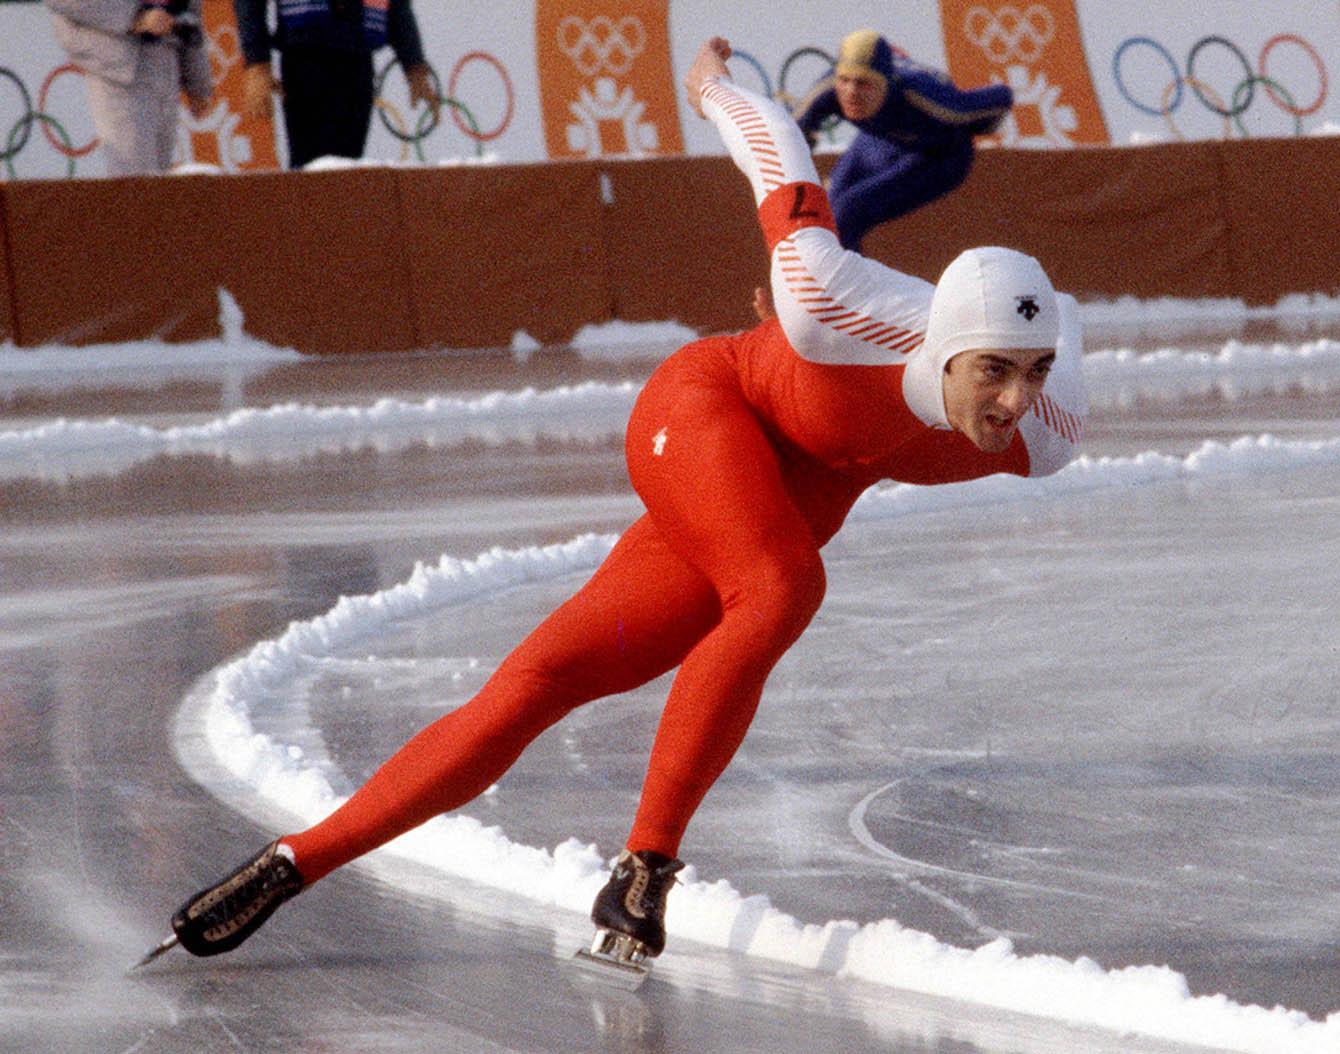 Gaetan Boucher skating